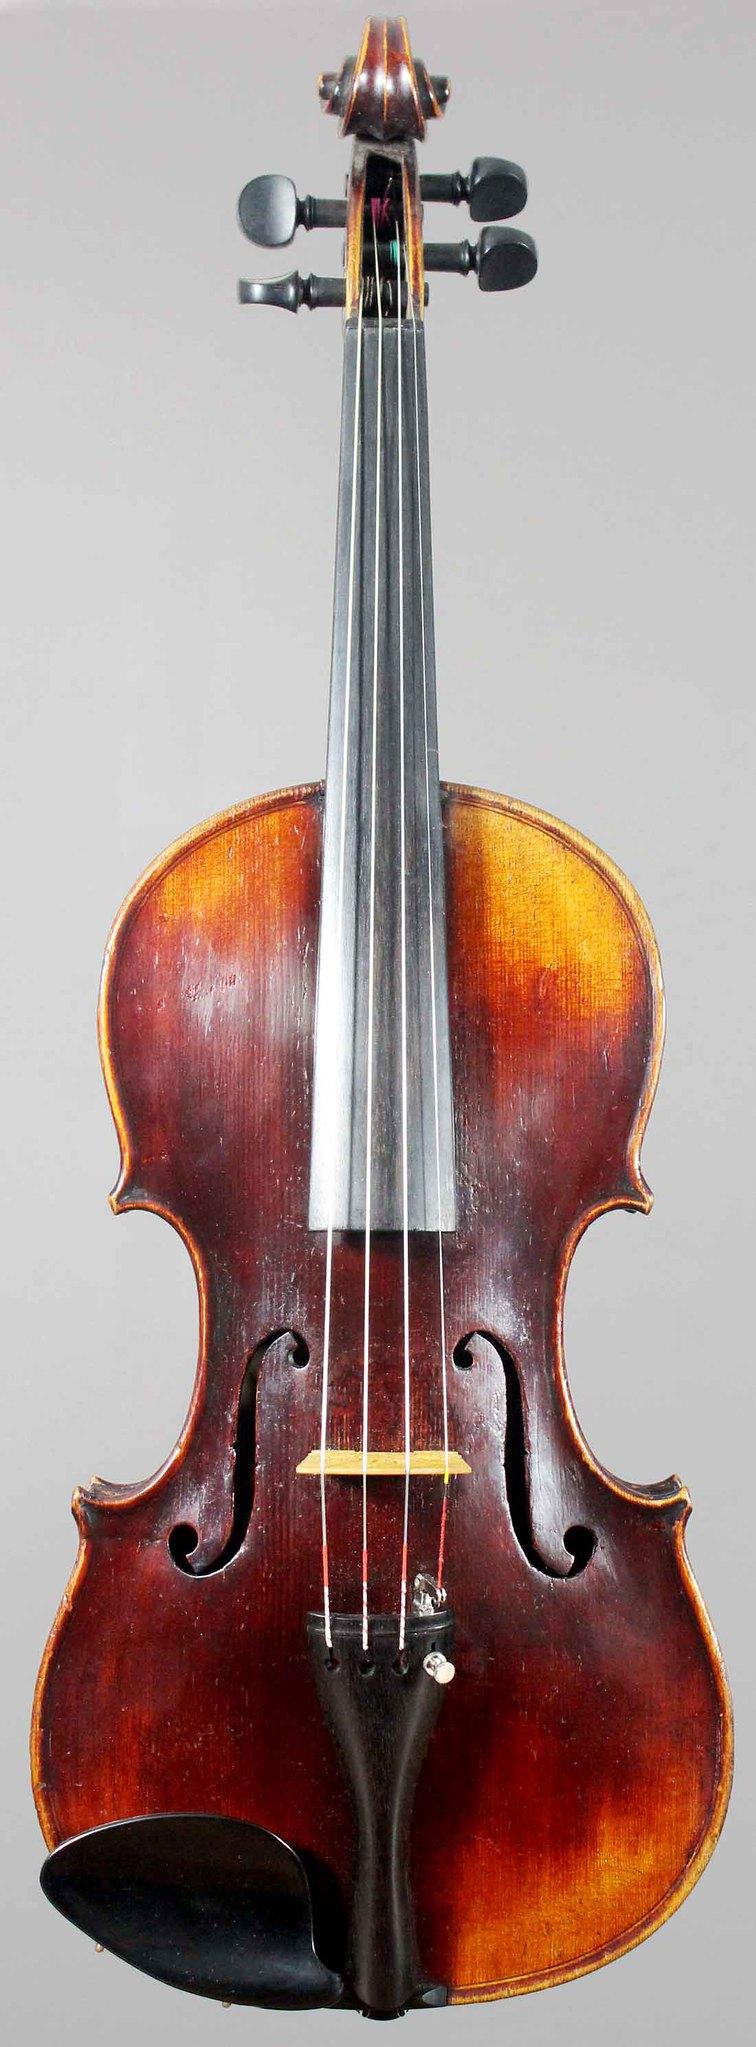 V171 Neuner and Hornsteiner Circa 1880 | Flickr Hornsteiner Violins Value